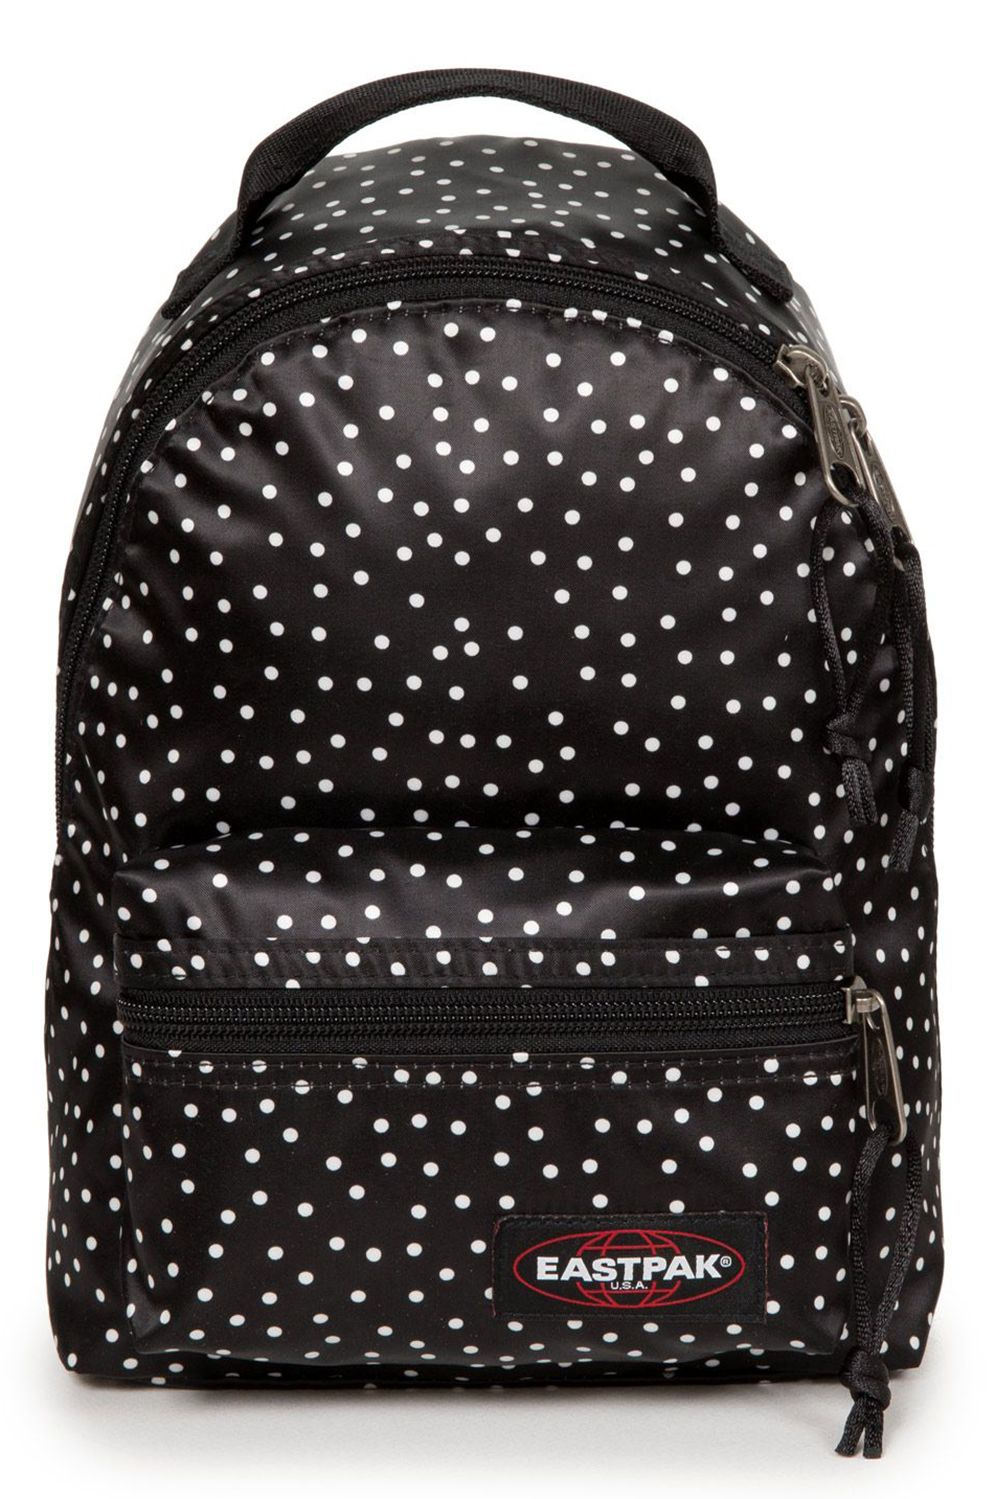 Eastpak Backpack ORBIT W Luxe Polka